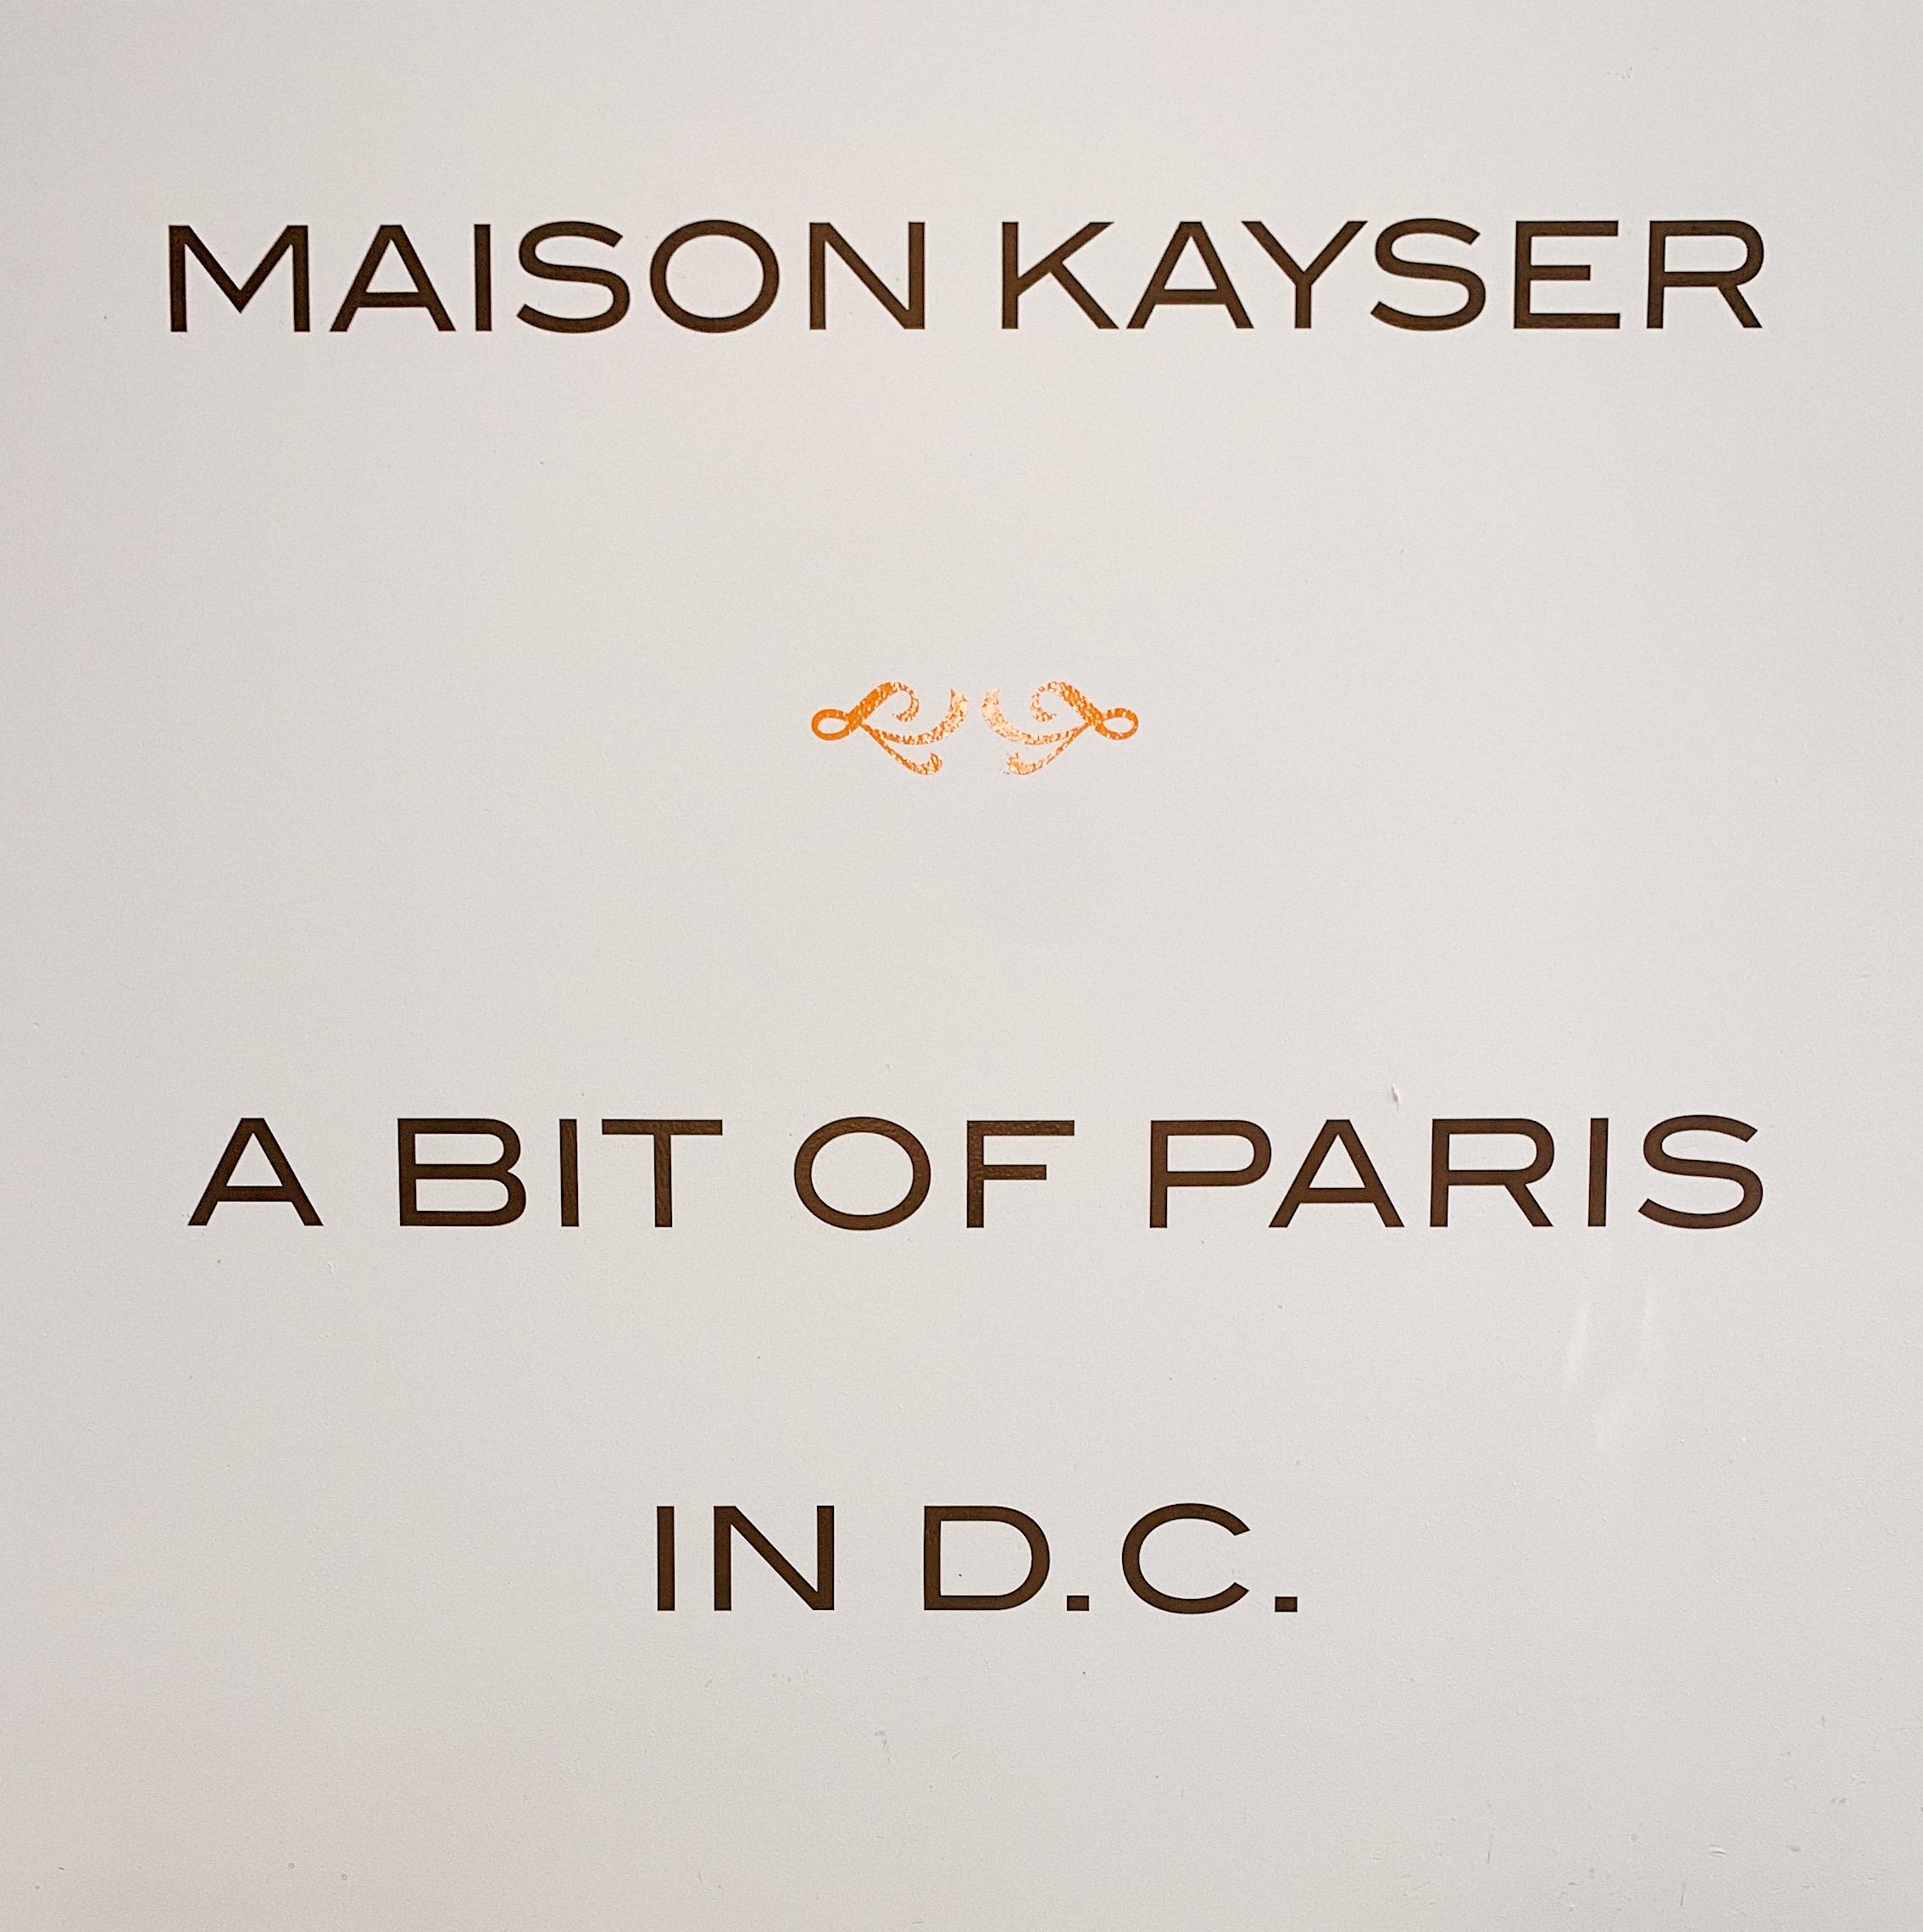 Maison Kayser D.C.